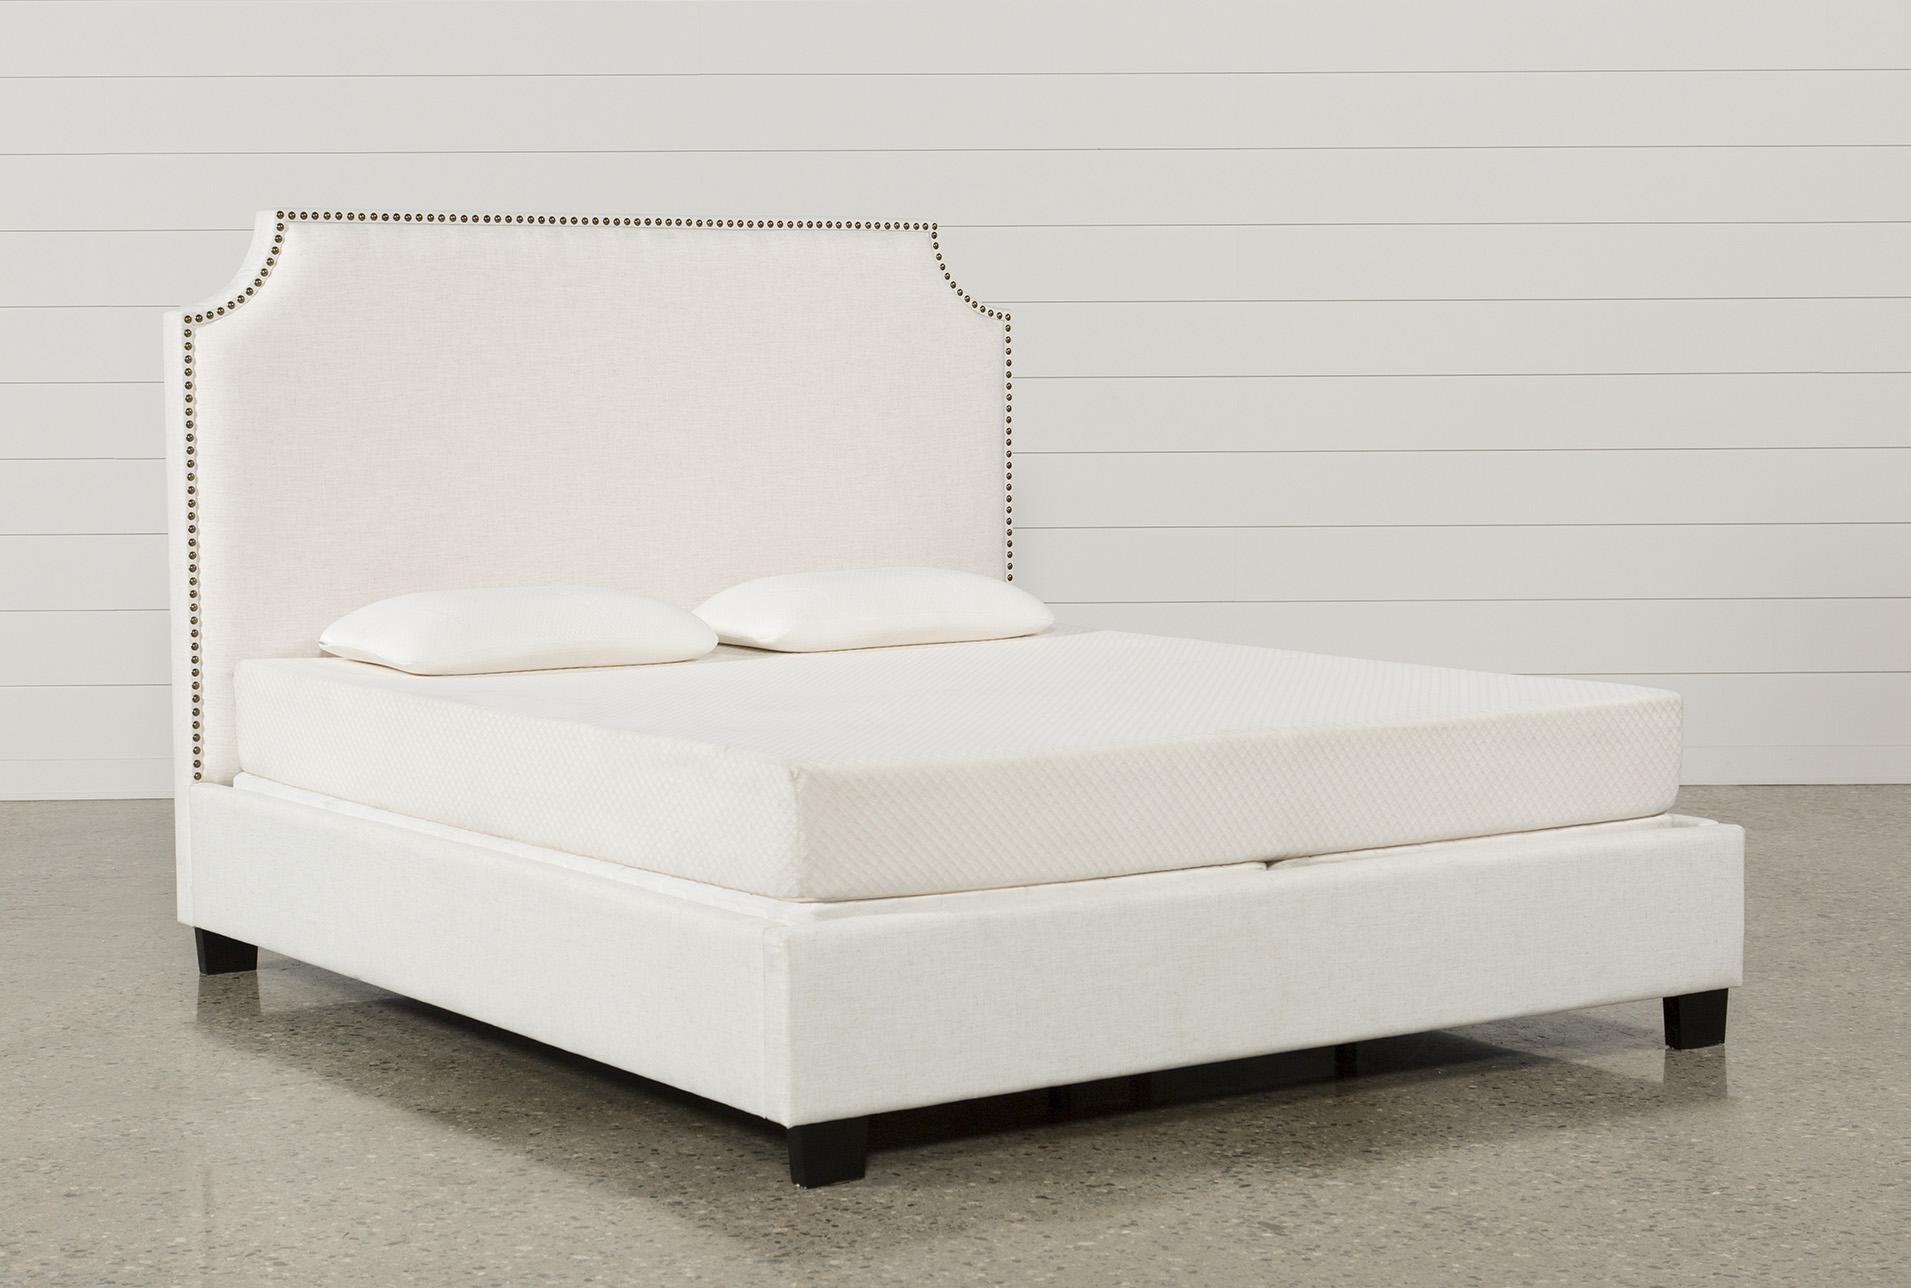 Short Steel Headboard//Footboard Bolt-On Retail Bed Frame Display ...